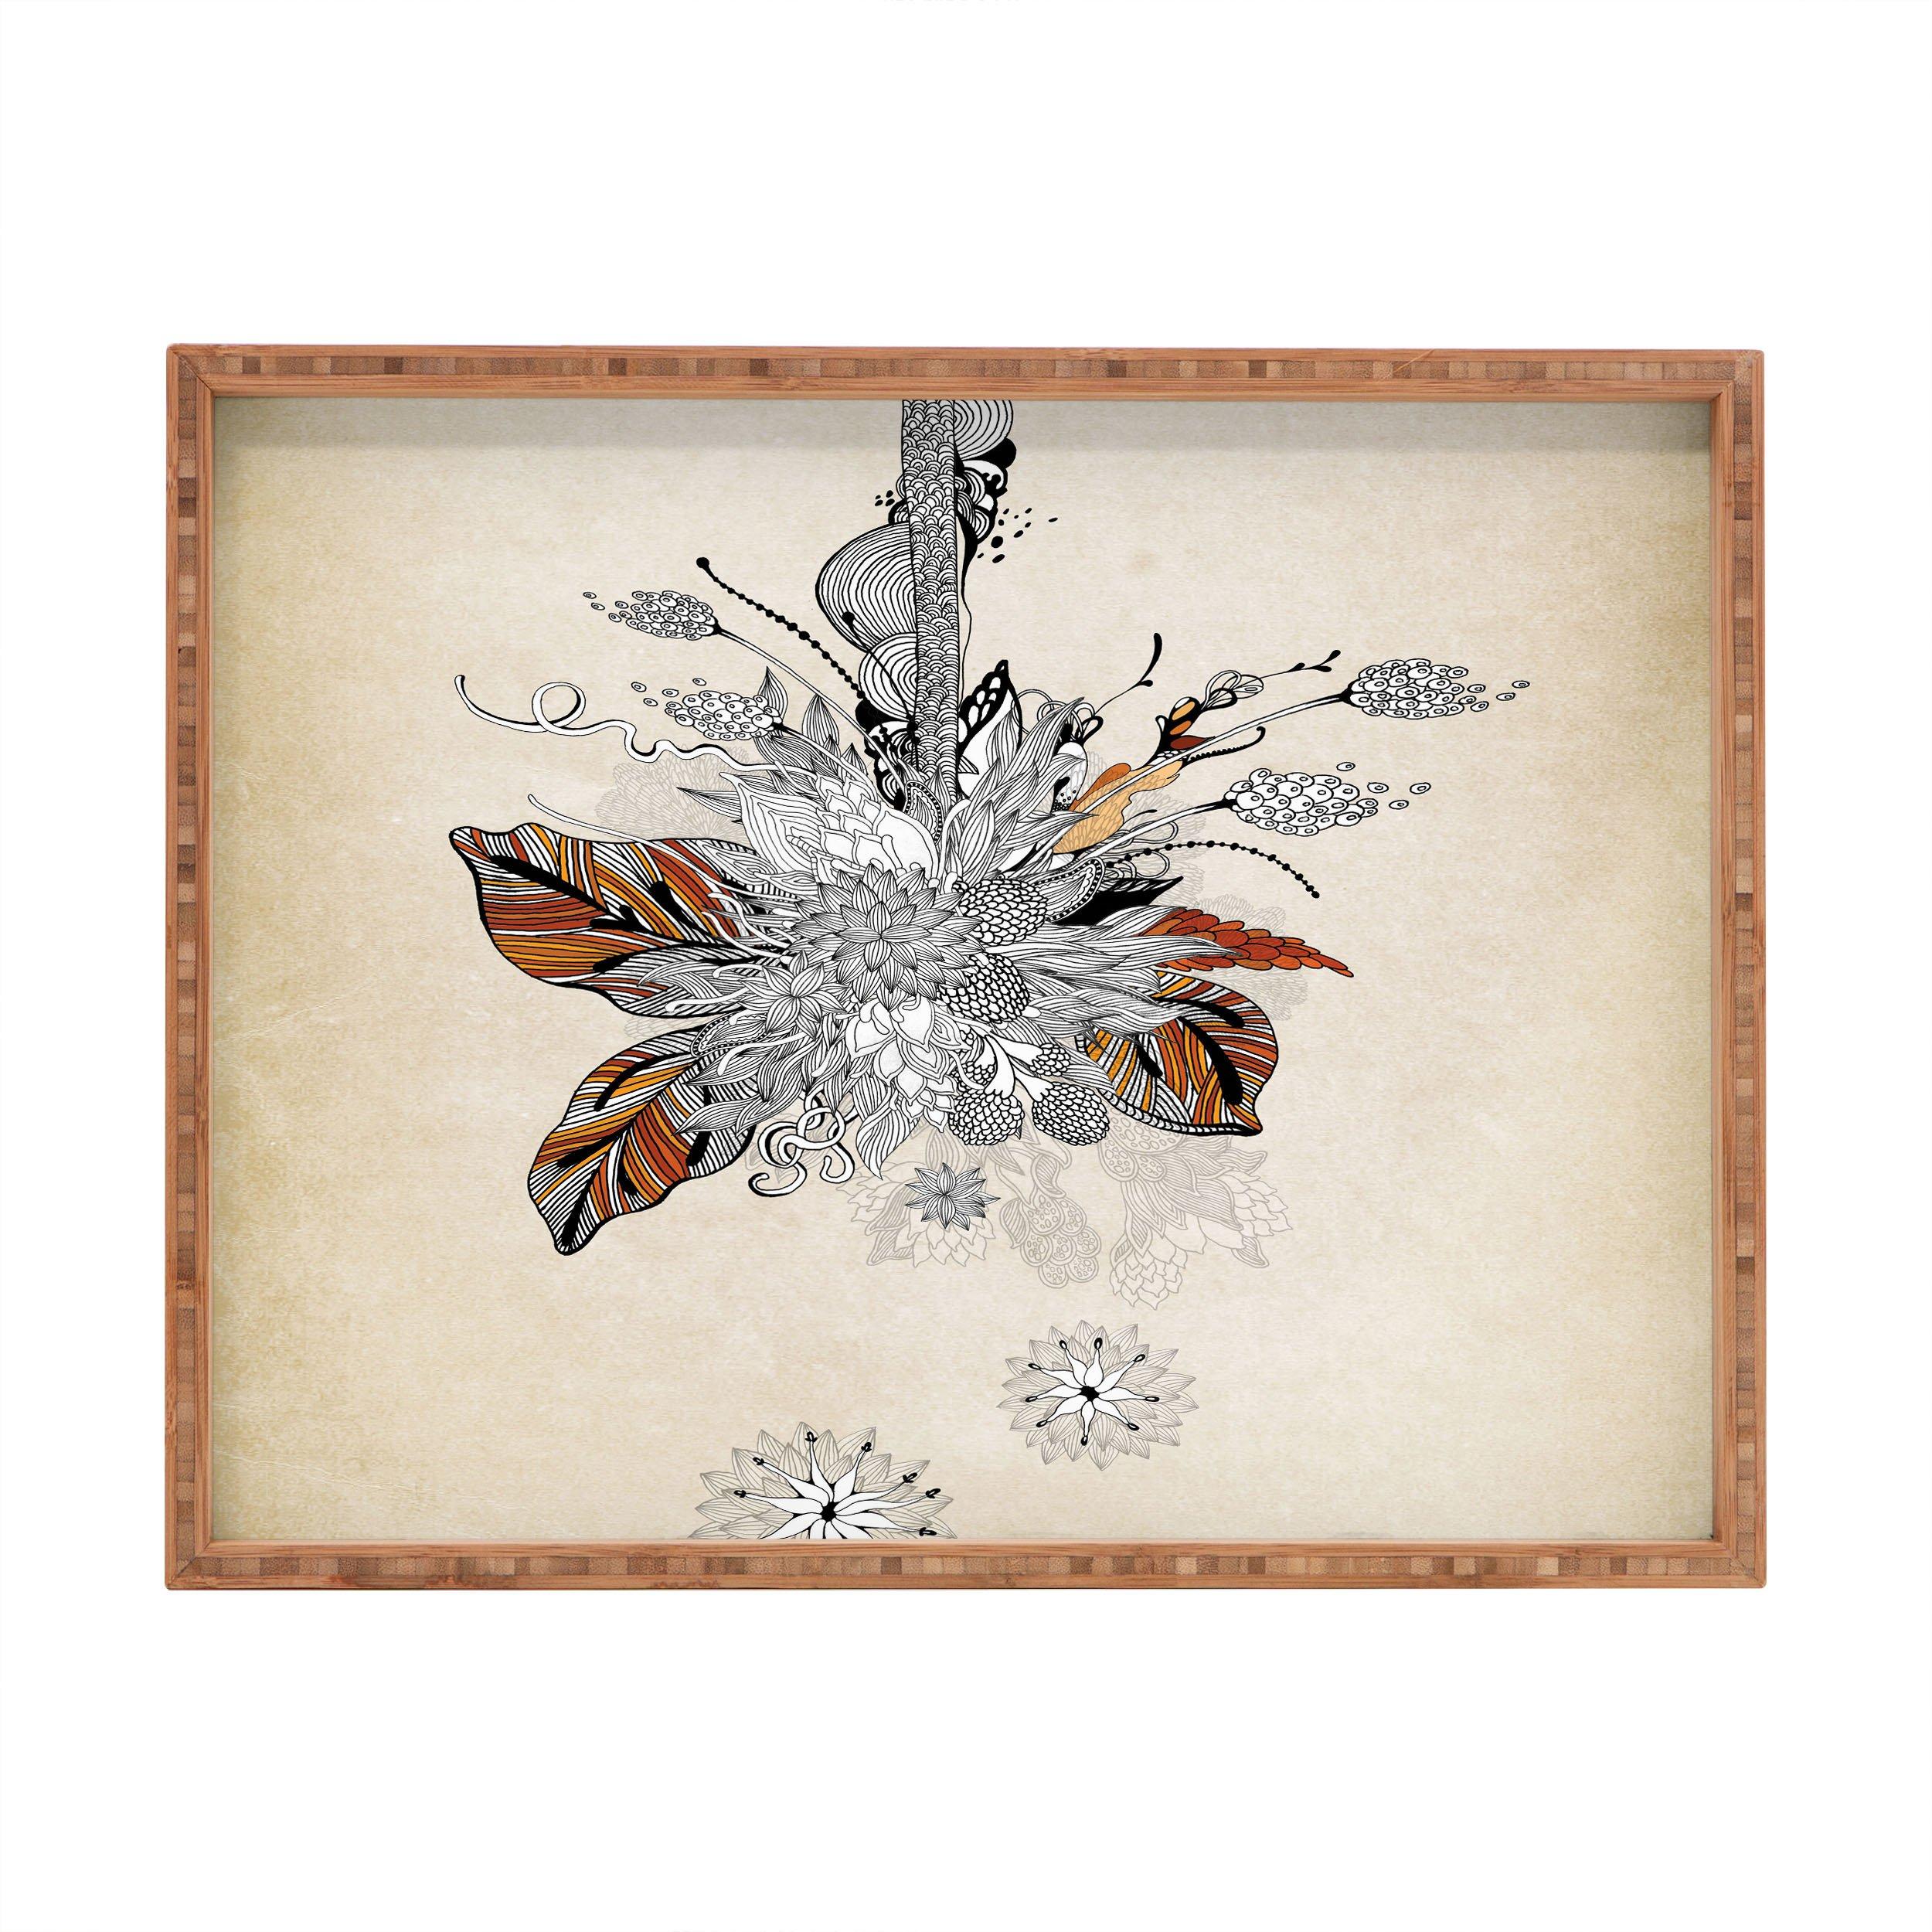 Deny Designs Iveta Abolina Floral 2 Indoor/Outdoor Rectangular Tray, 17'' x 22.5''